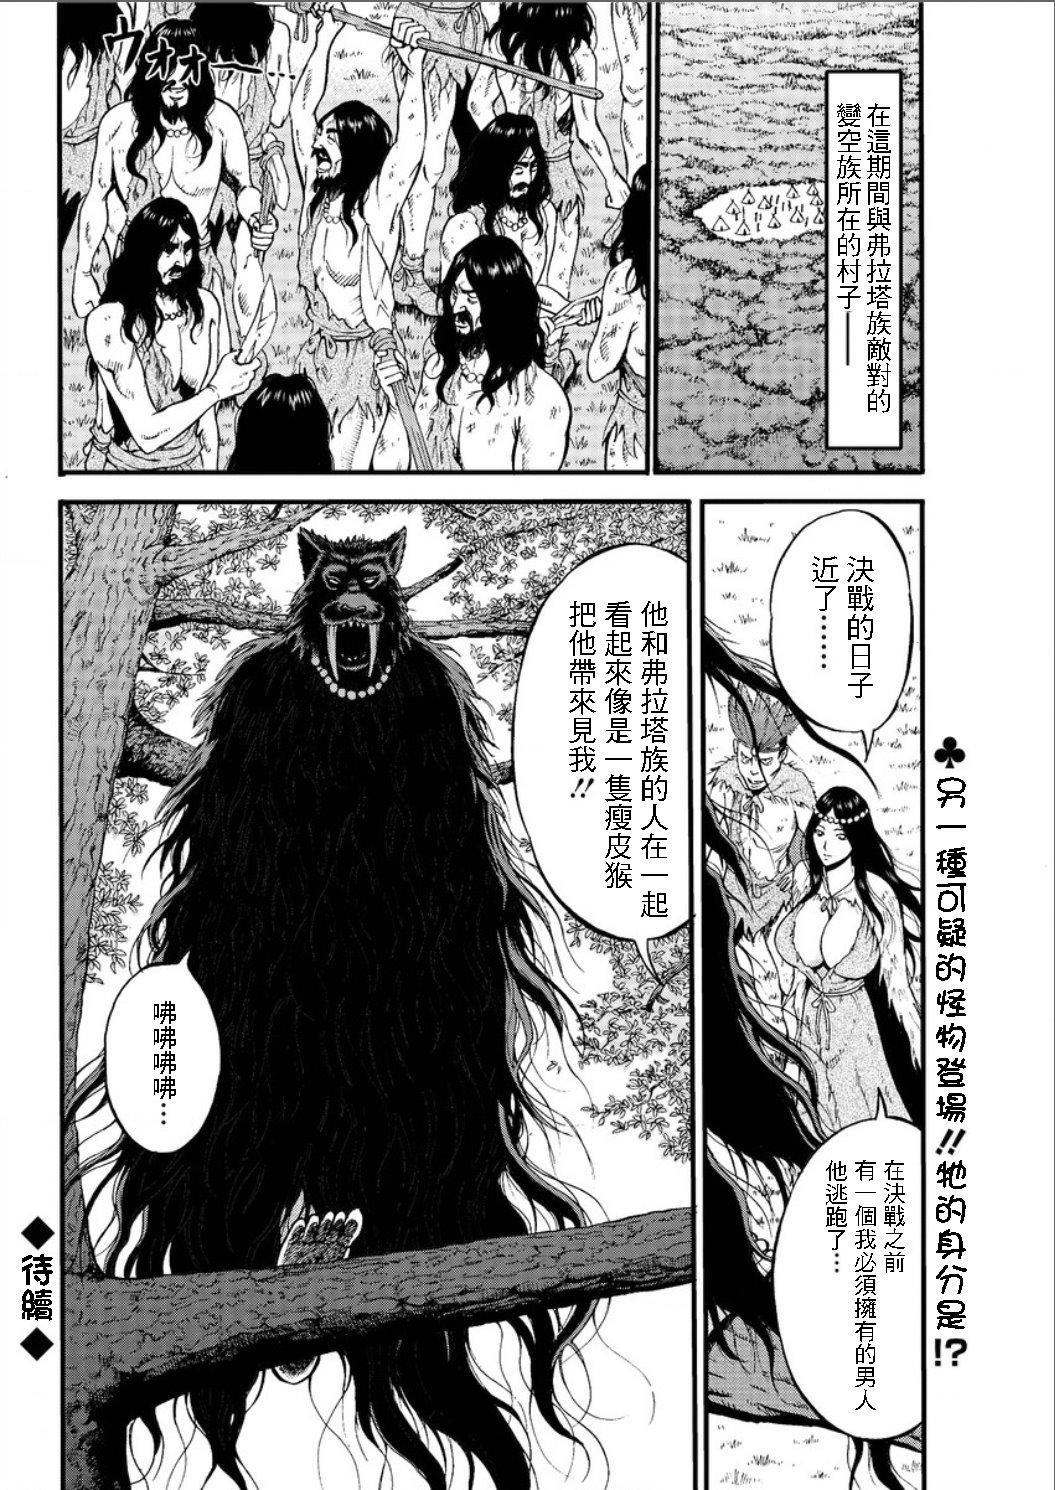 Kigenzen 10000 Nen no Ota | 史前一萬年的宅男 Ch. 19-24 54